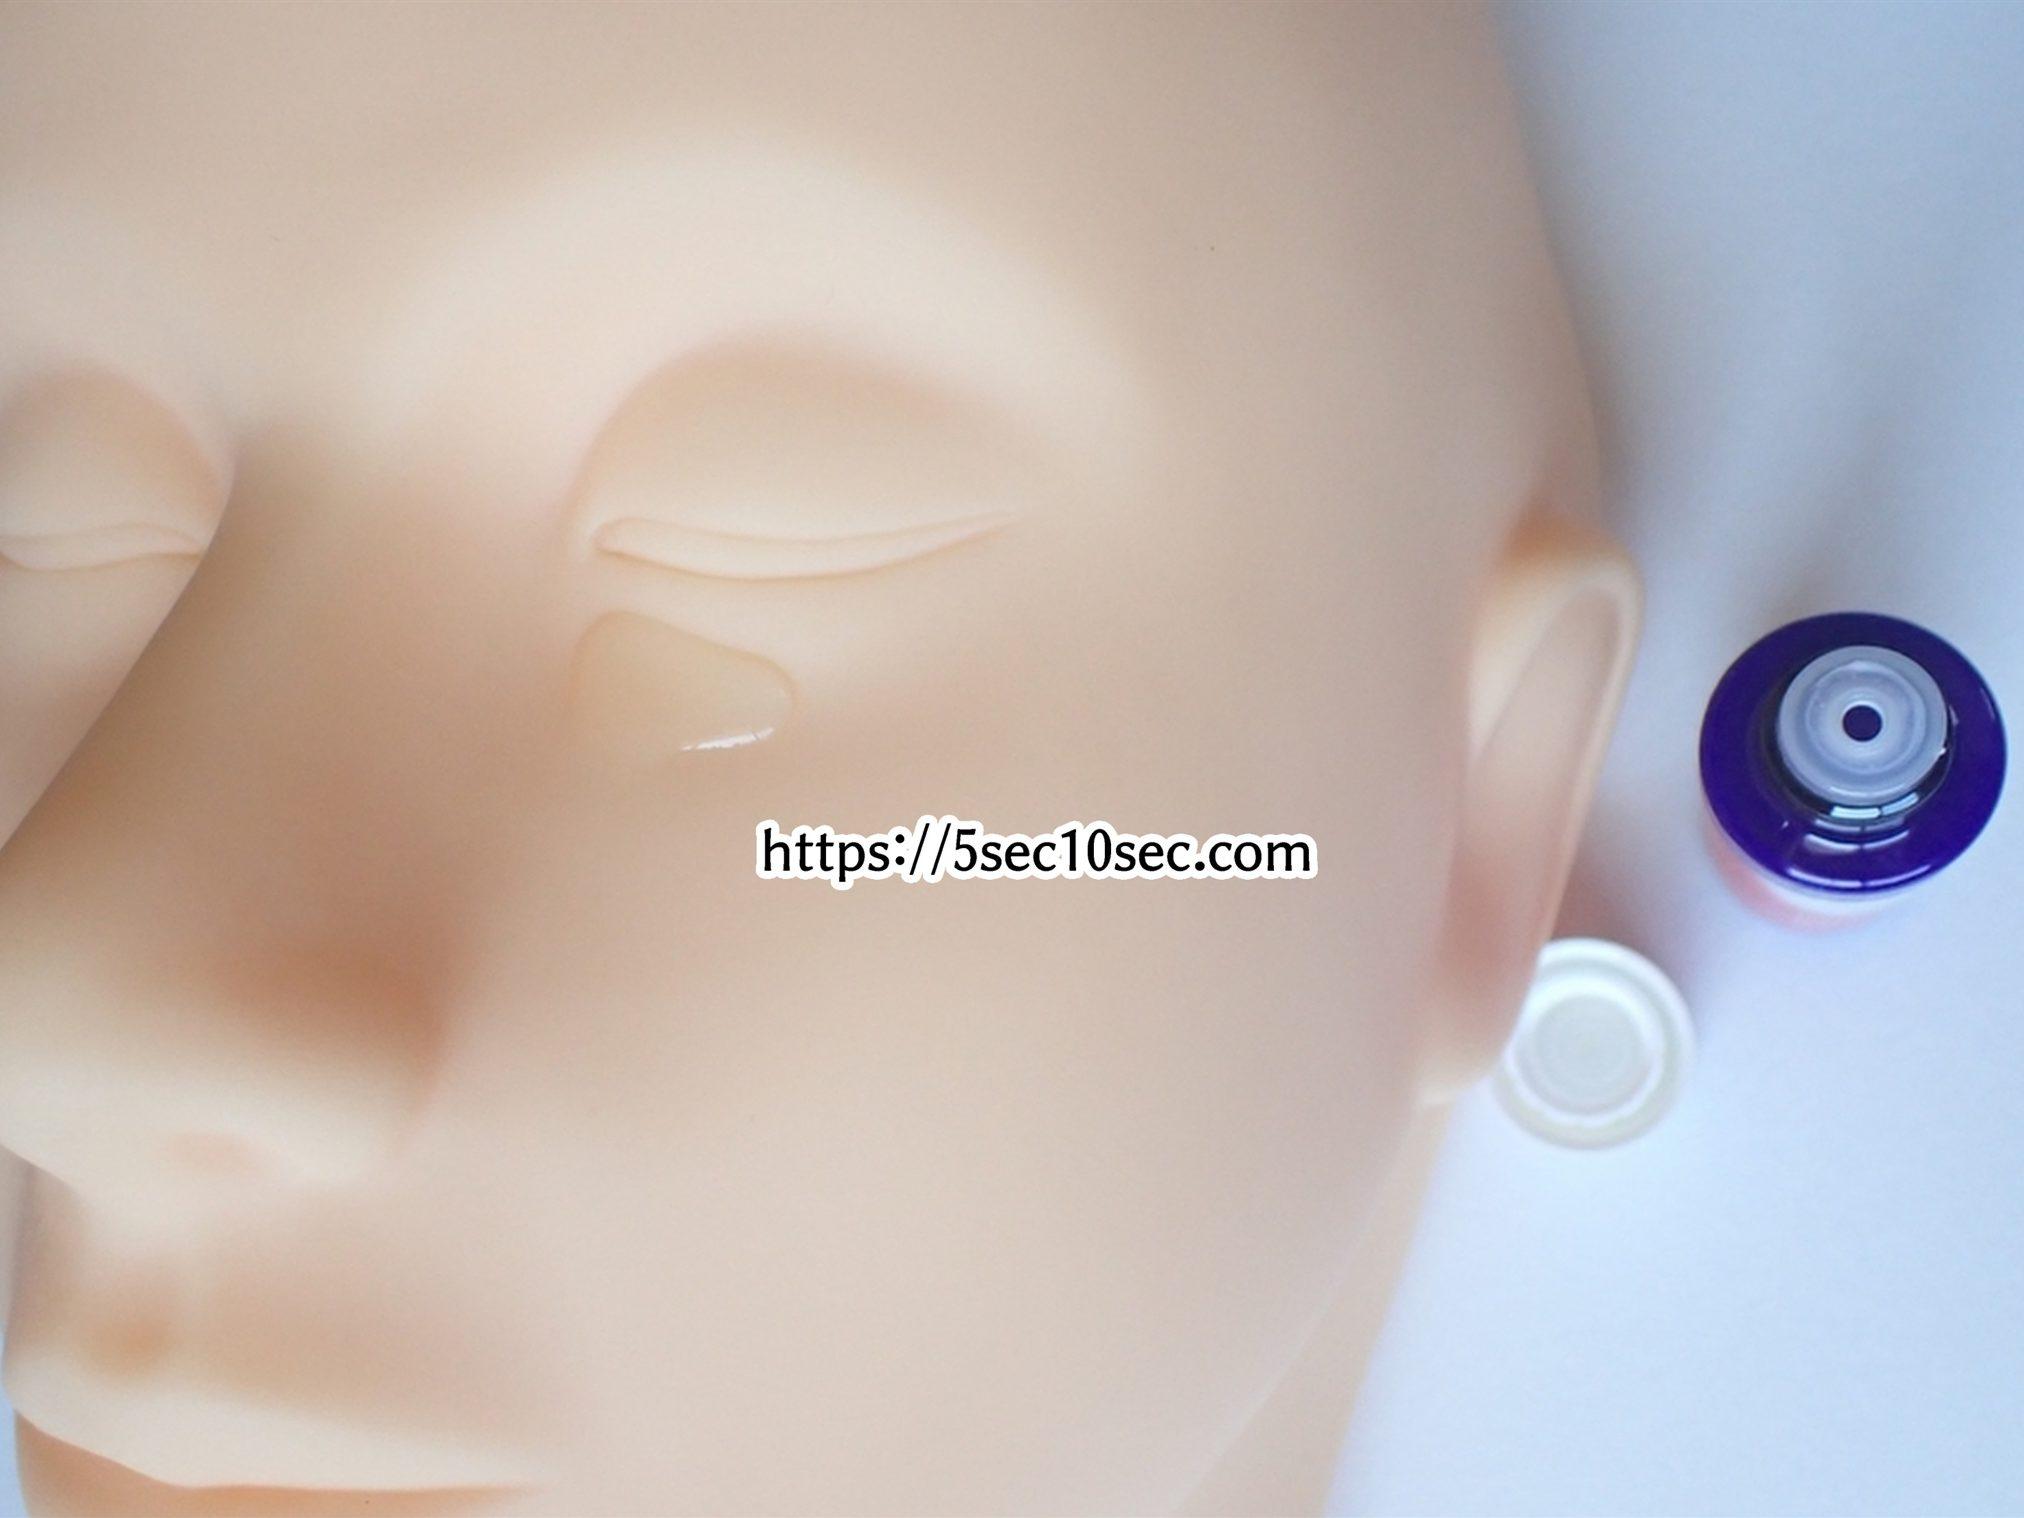 WELEDA ヴェレダ ワイルドローズ モイスチャーローション 肌の上に留まるような高保湿の、とろみ化粧水です